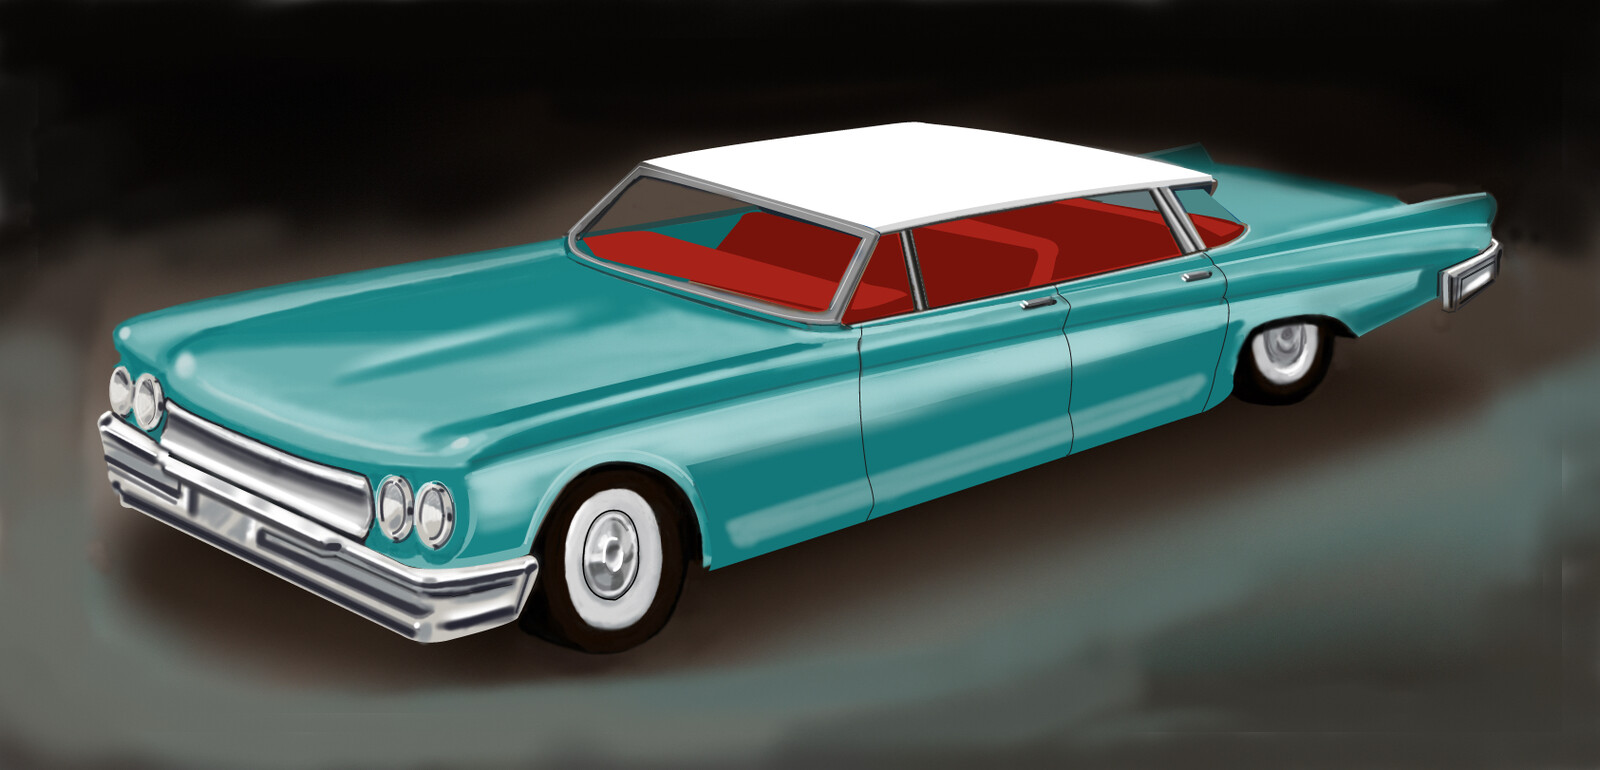 Digital drawing of a toy car.